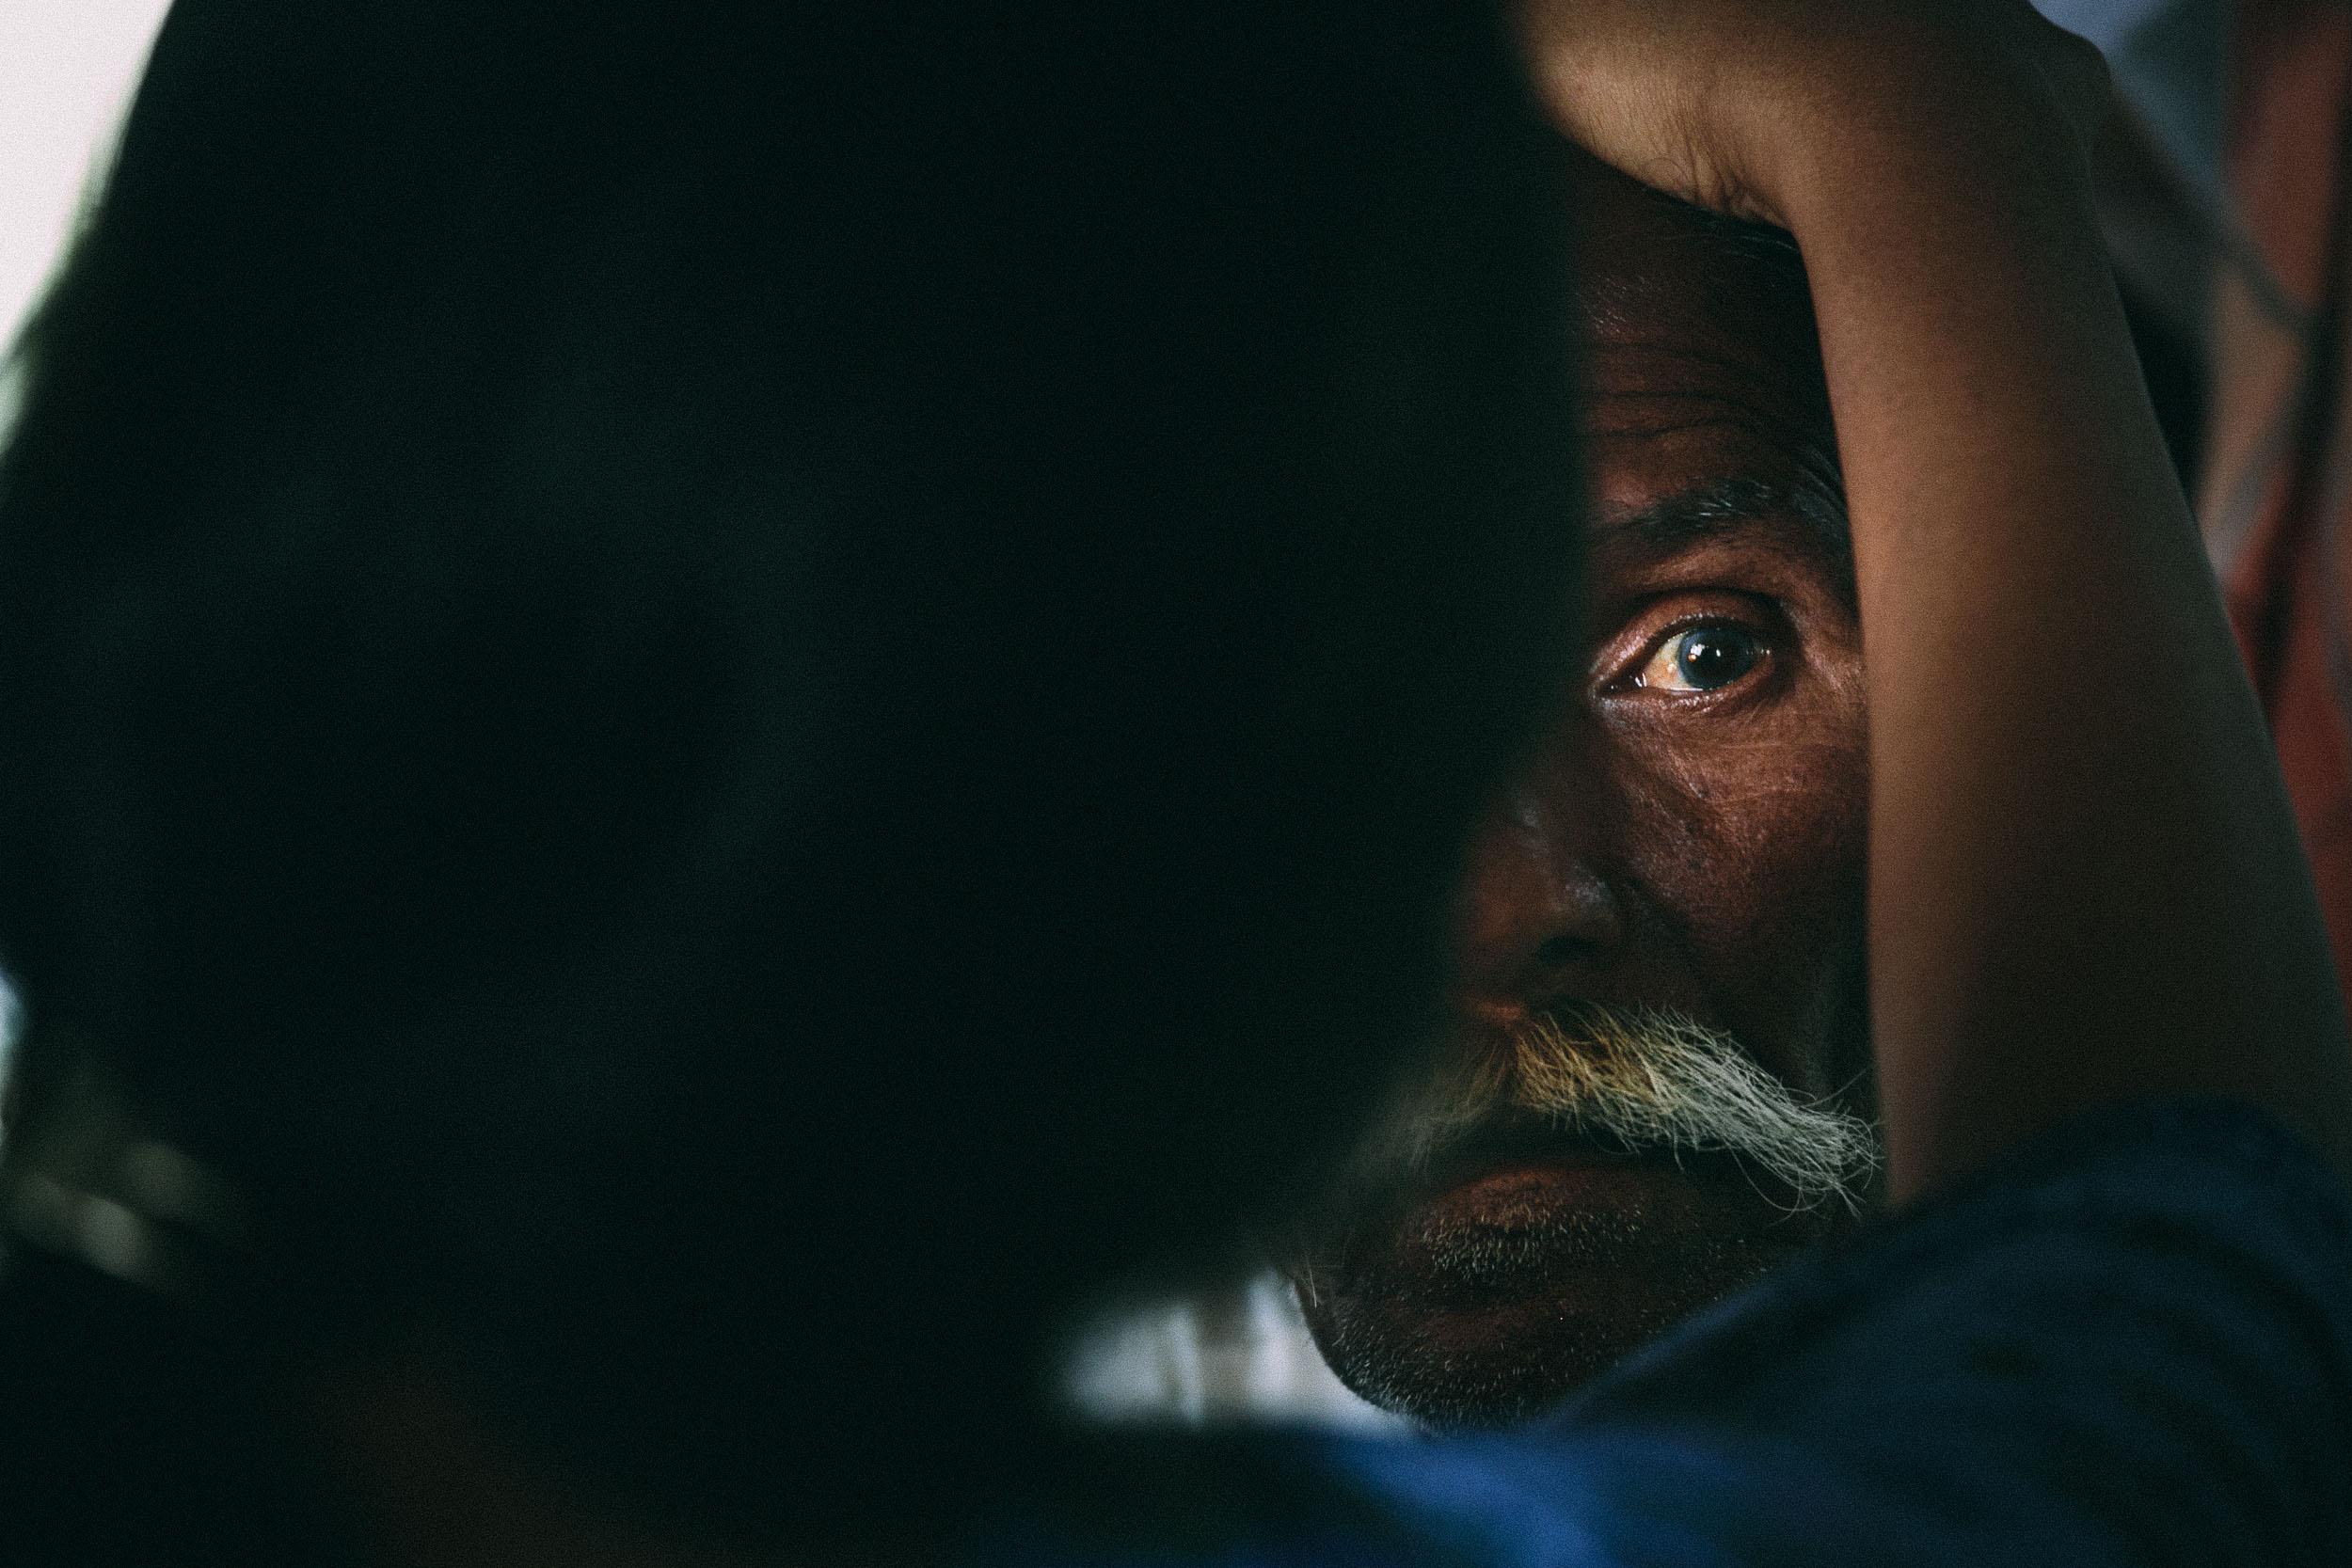 brian-callaway-india-photography-aravind-eye-hospital-16.jpg